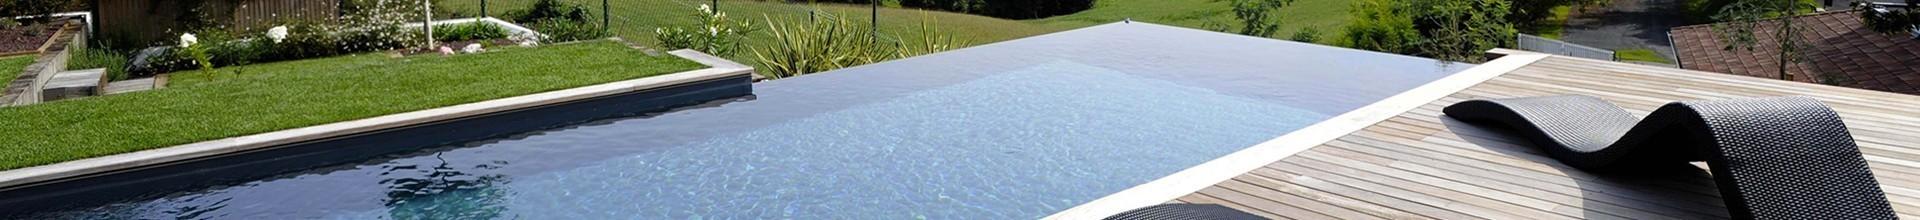 Direct usine, piscine coque prix Loire